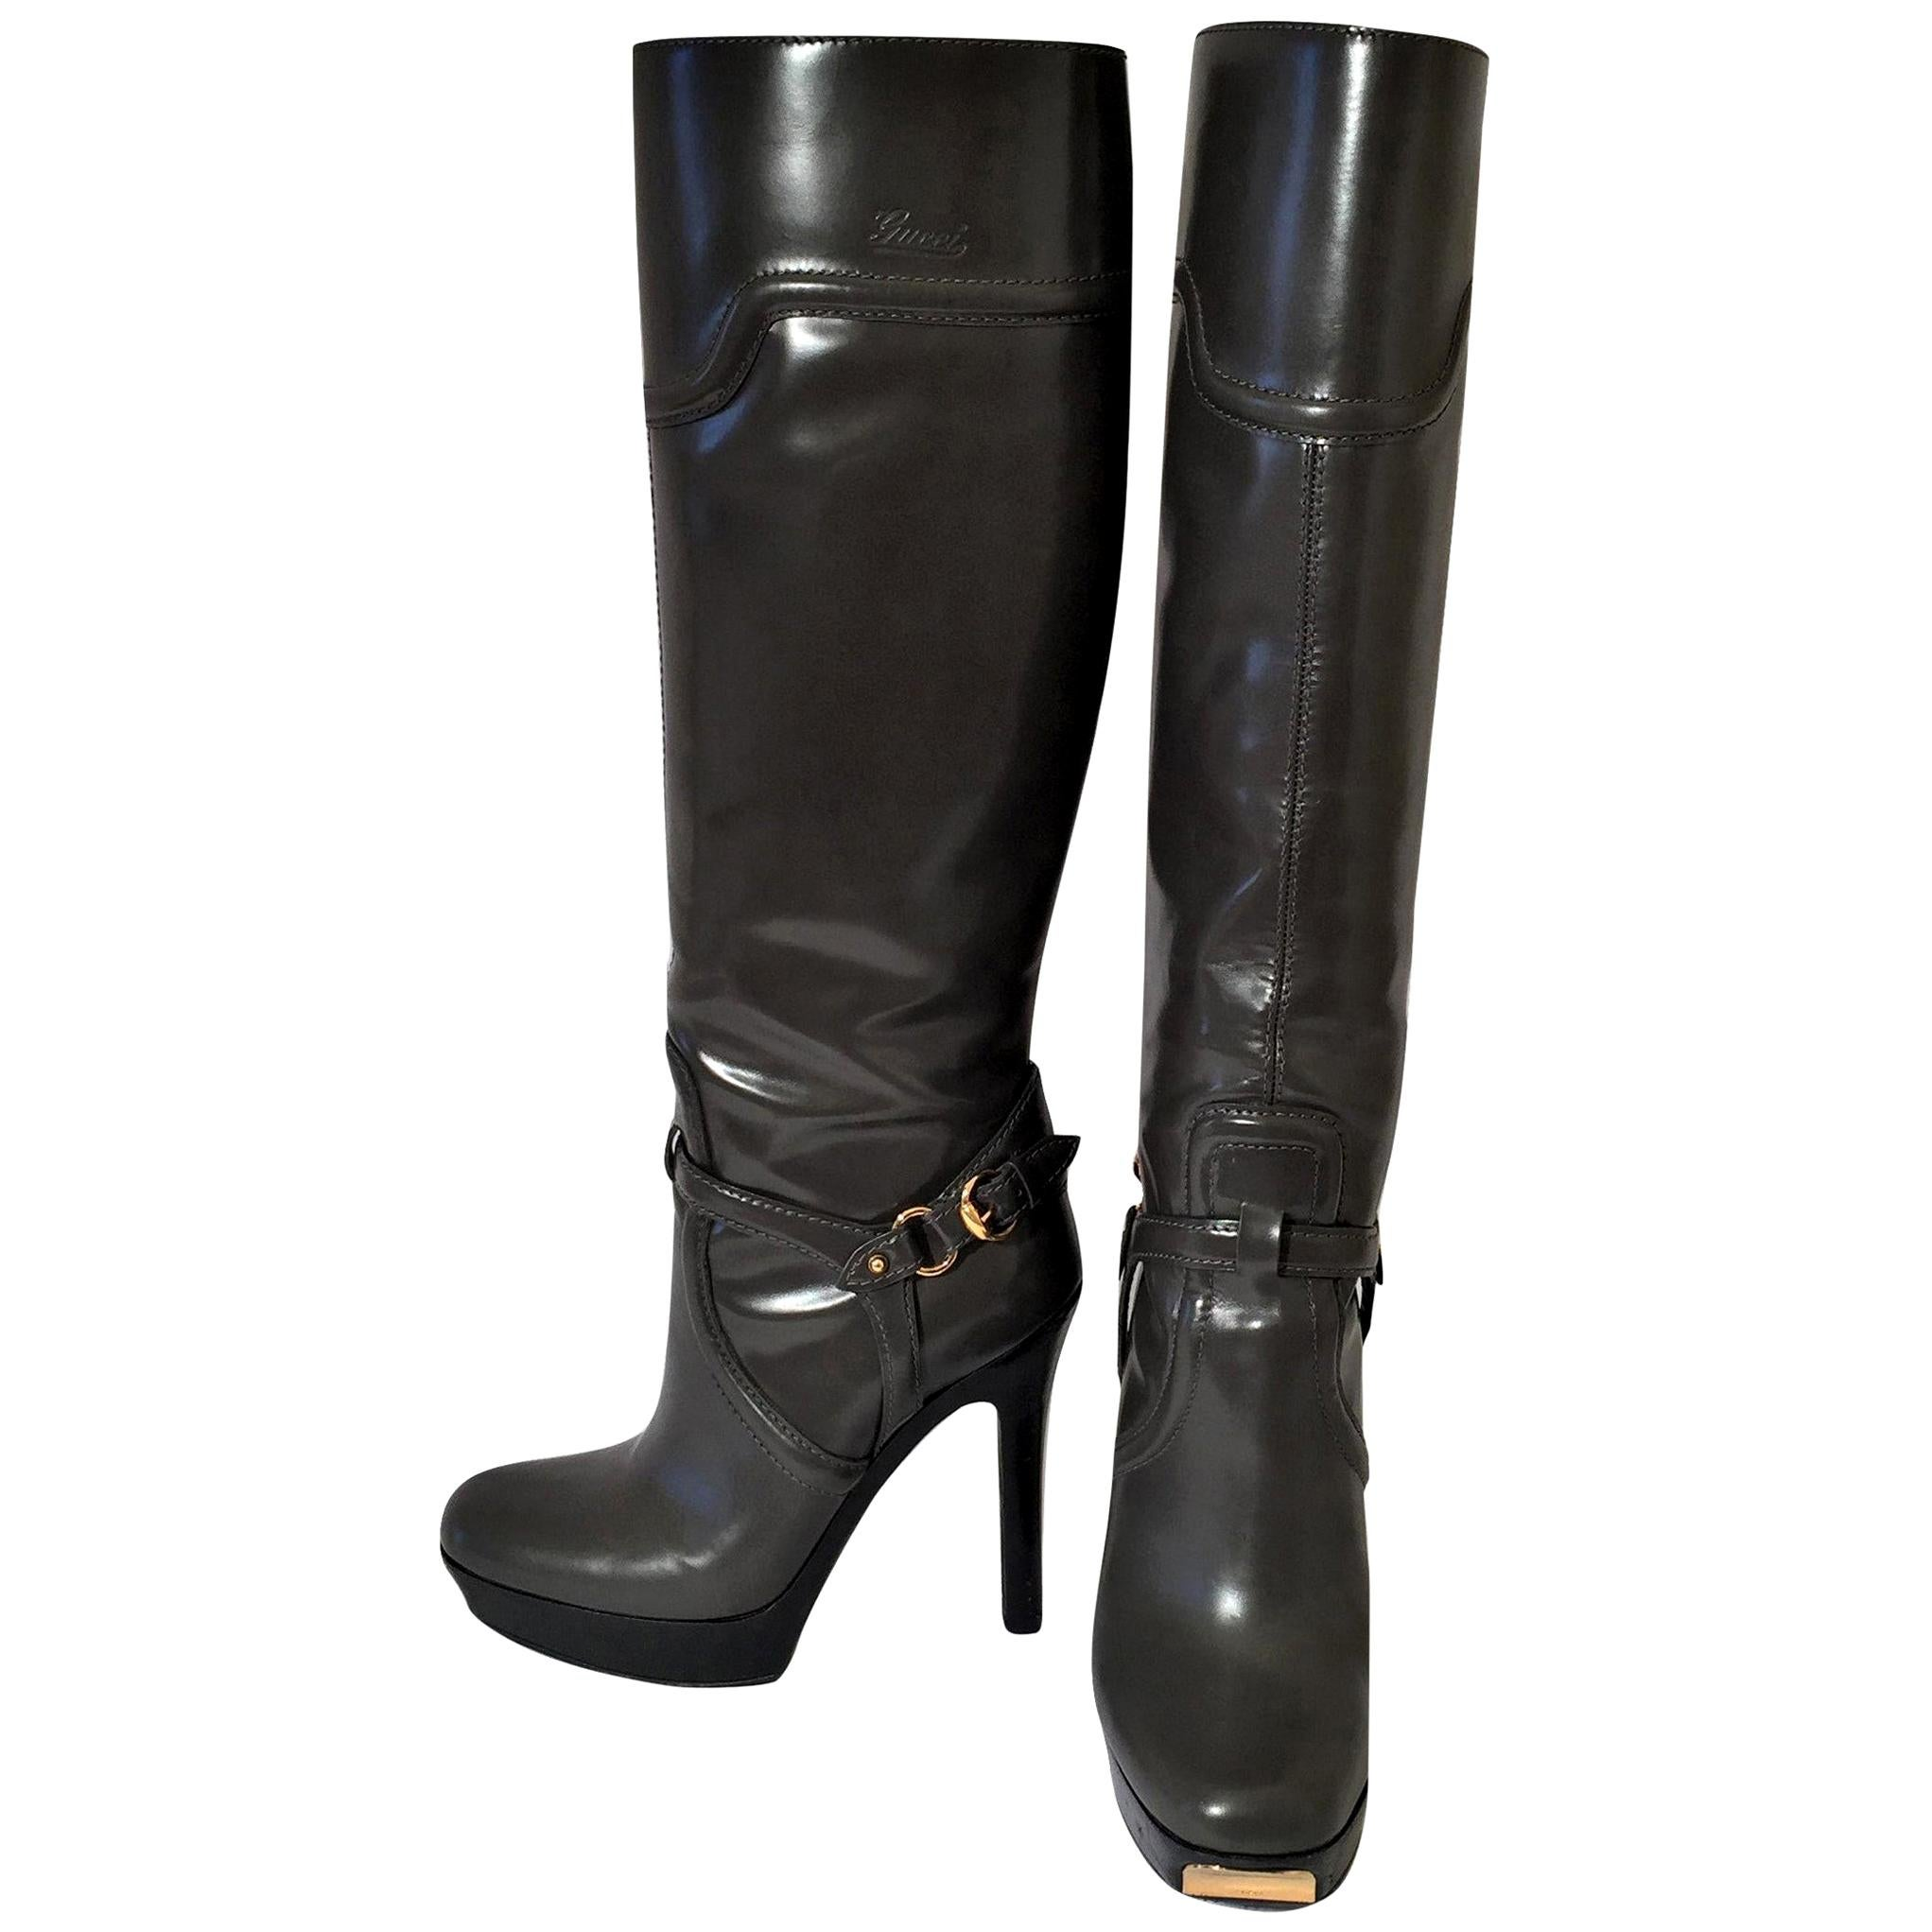 Gucci Dark Gray Leather Platform Boots Sz 6